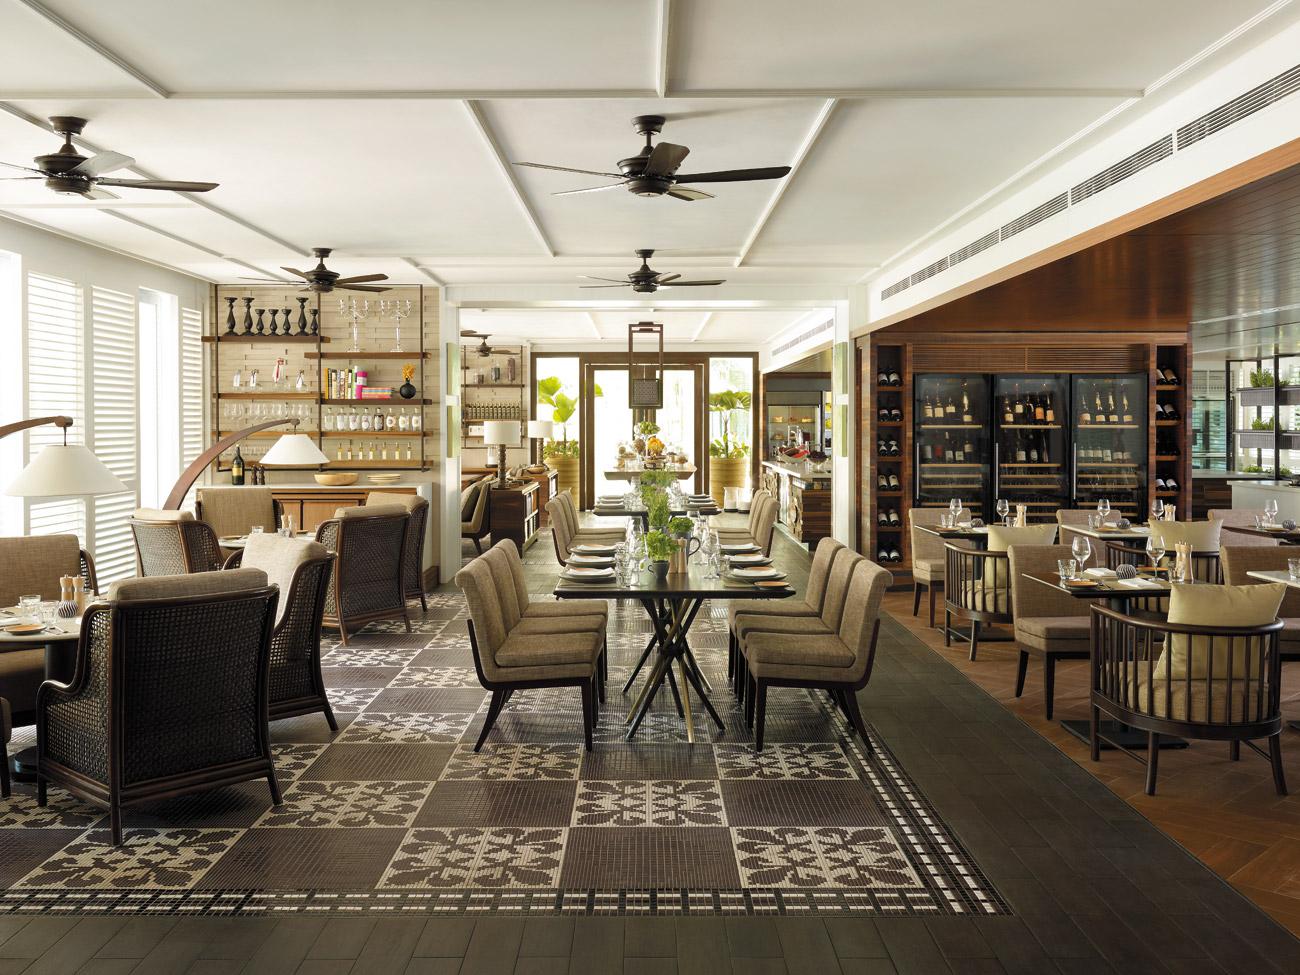 Business Marketing Plan for Shangri-La Hotel at The Shard London